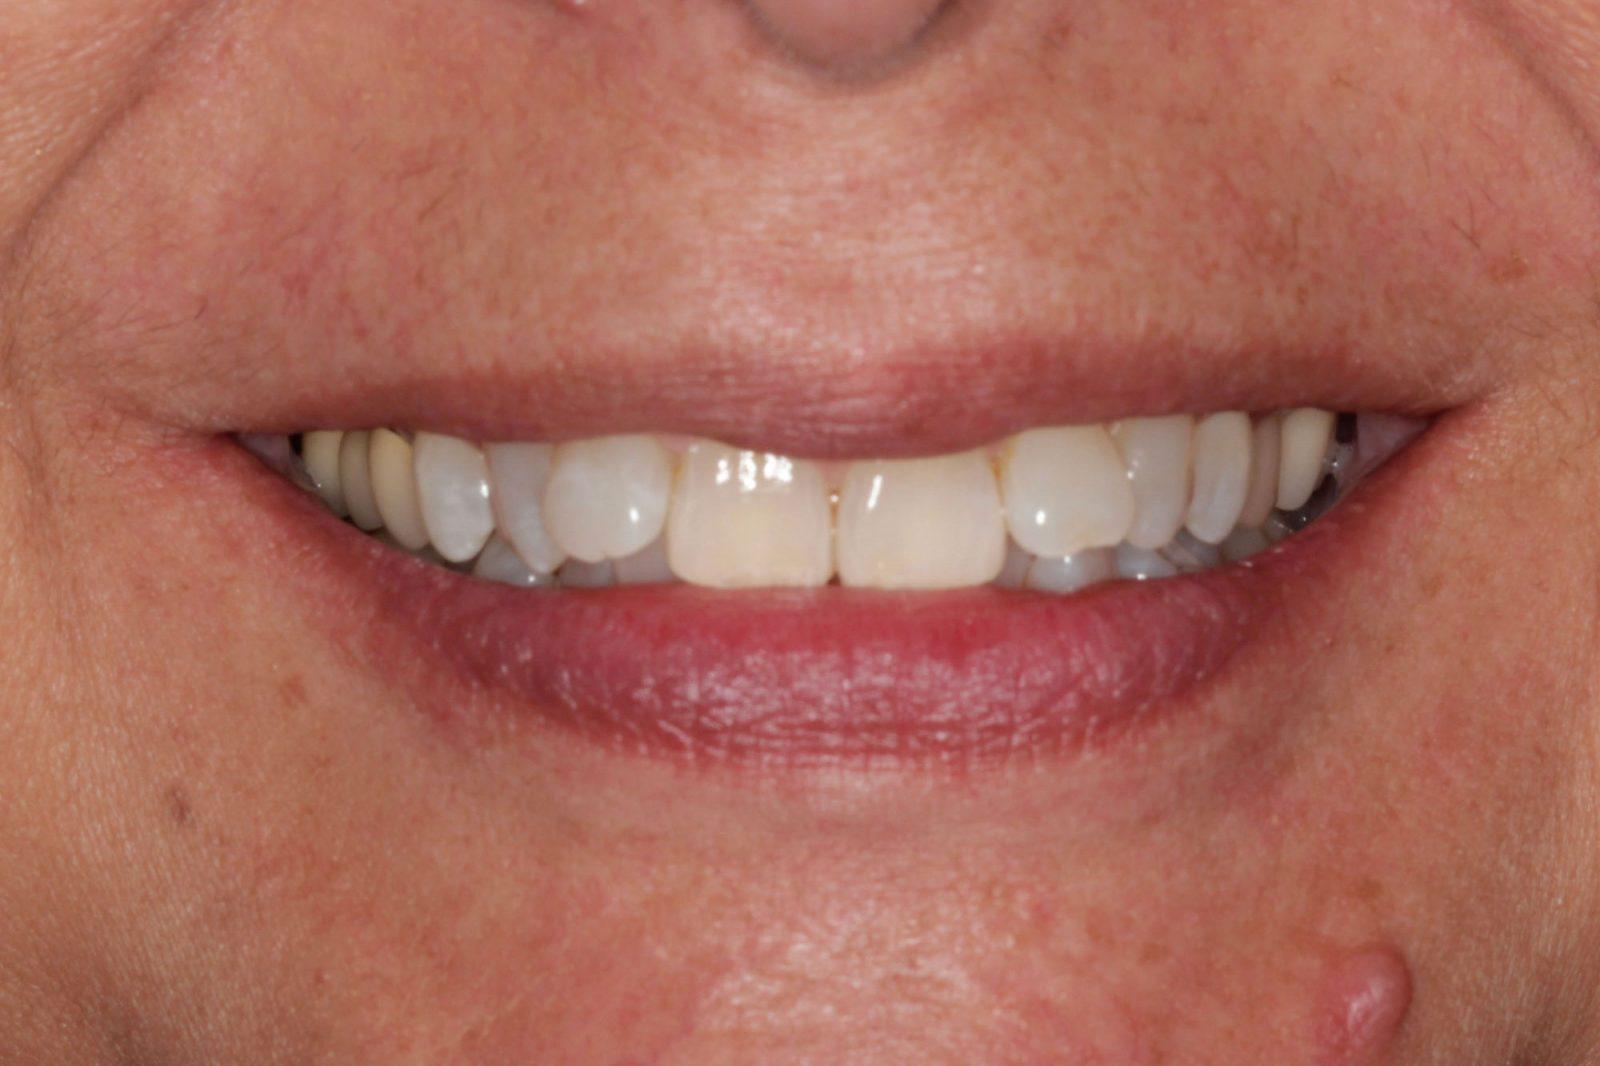 Invisalign Orthodontics treatment